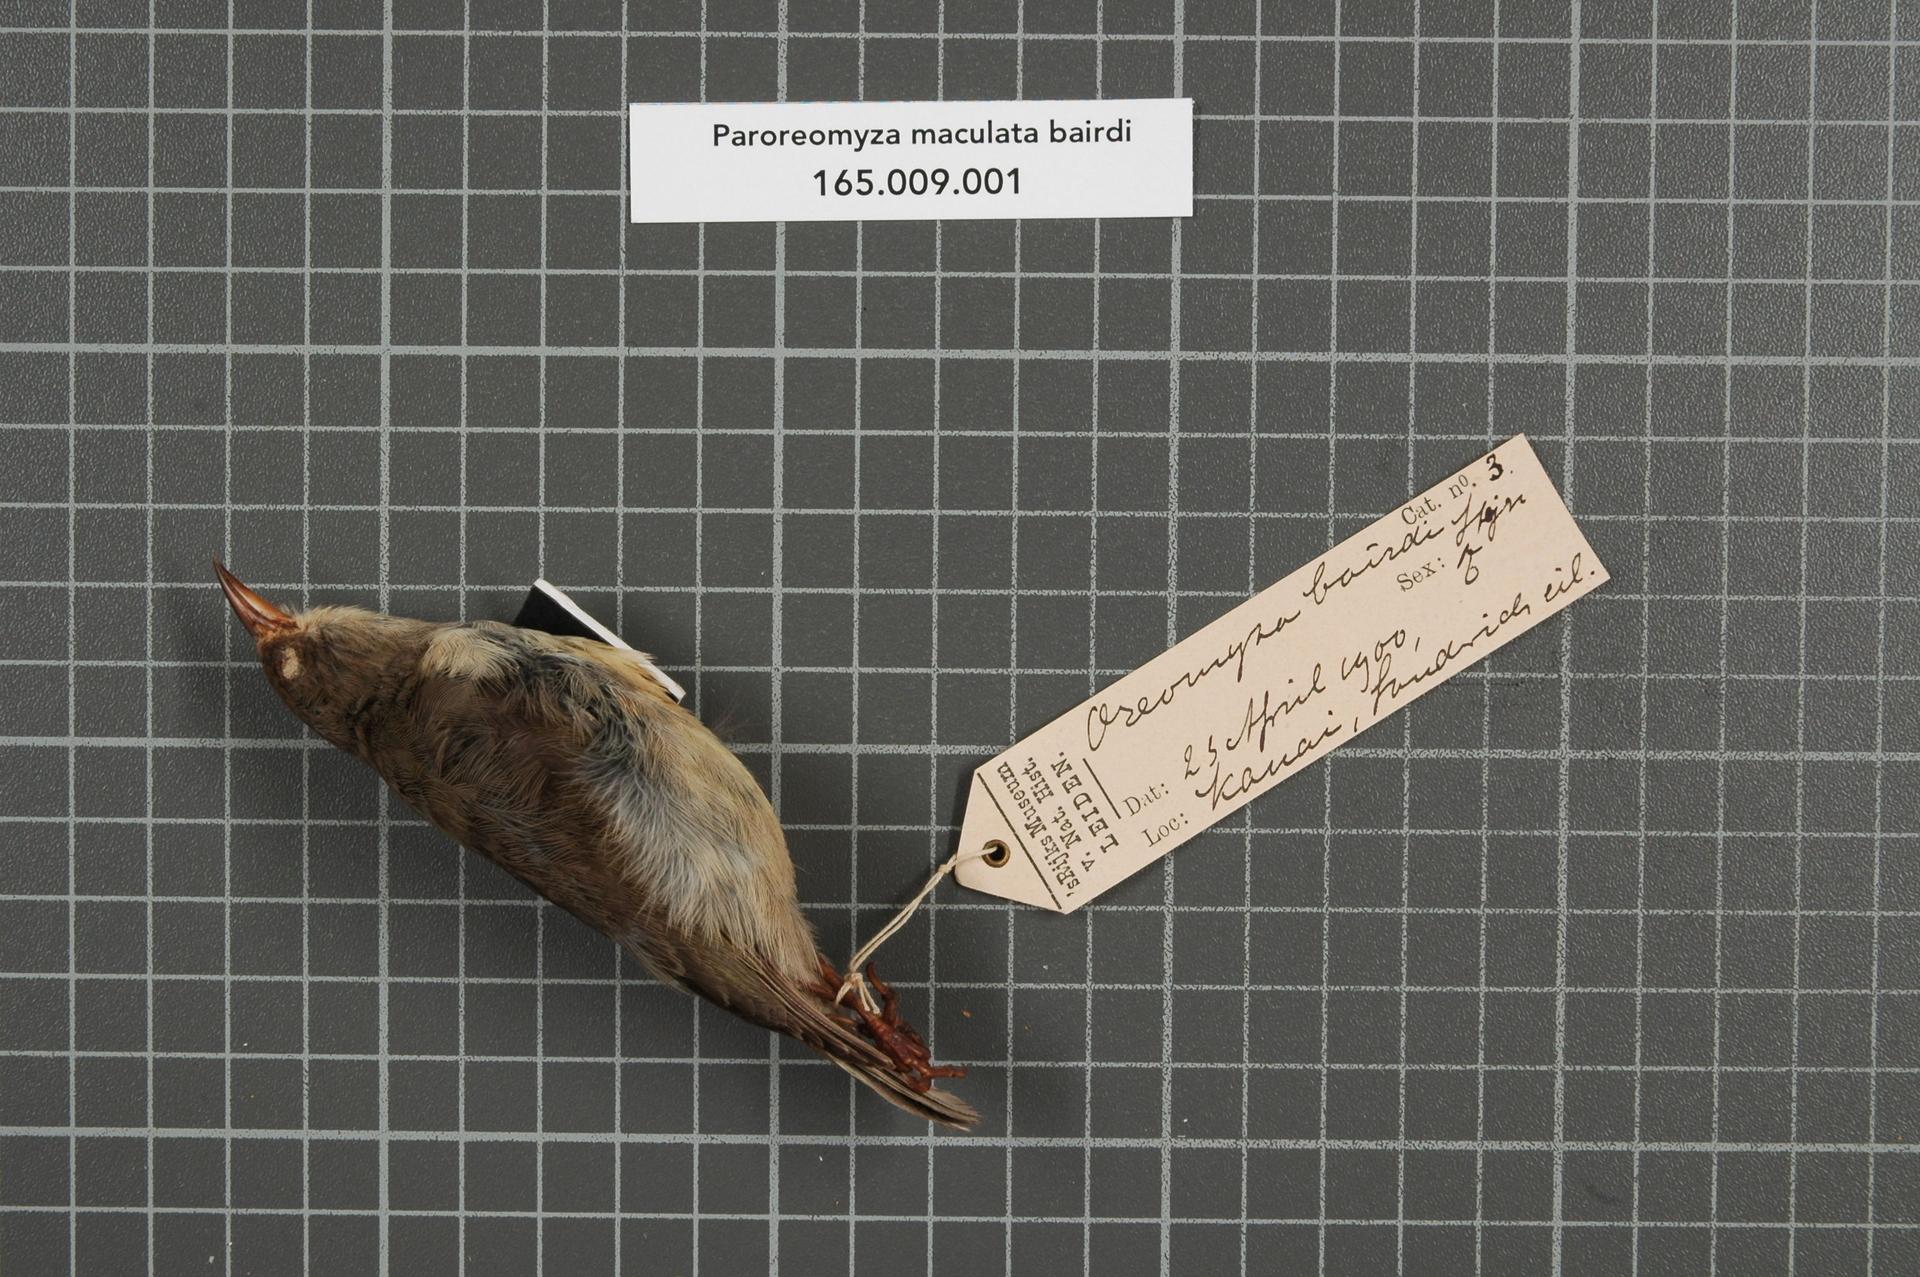 RMNH.AVES.148588 | Paroreomyza maculata bairdi Stejneger, 1887